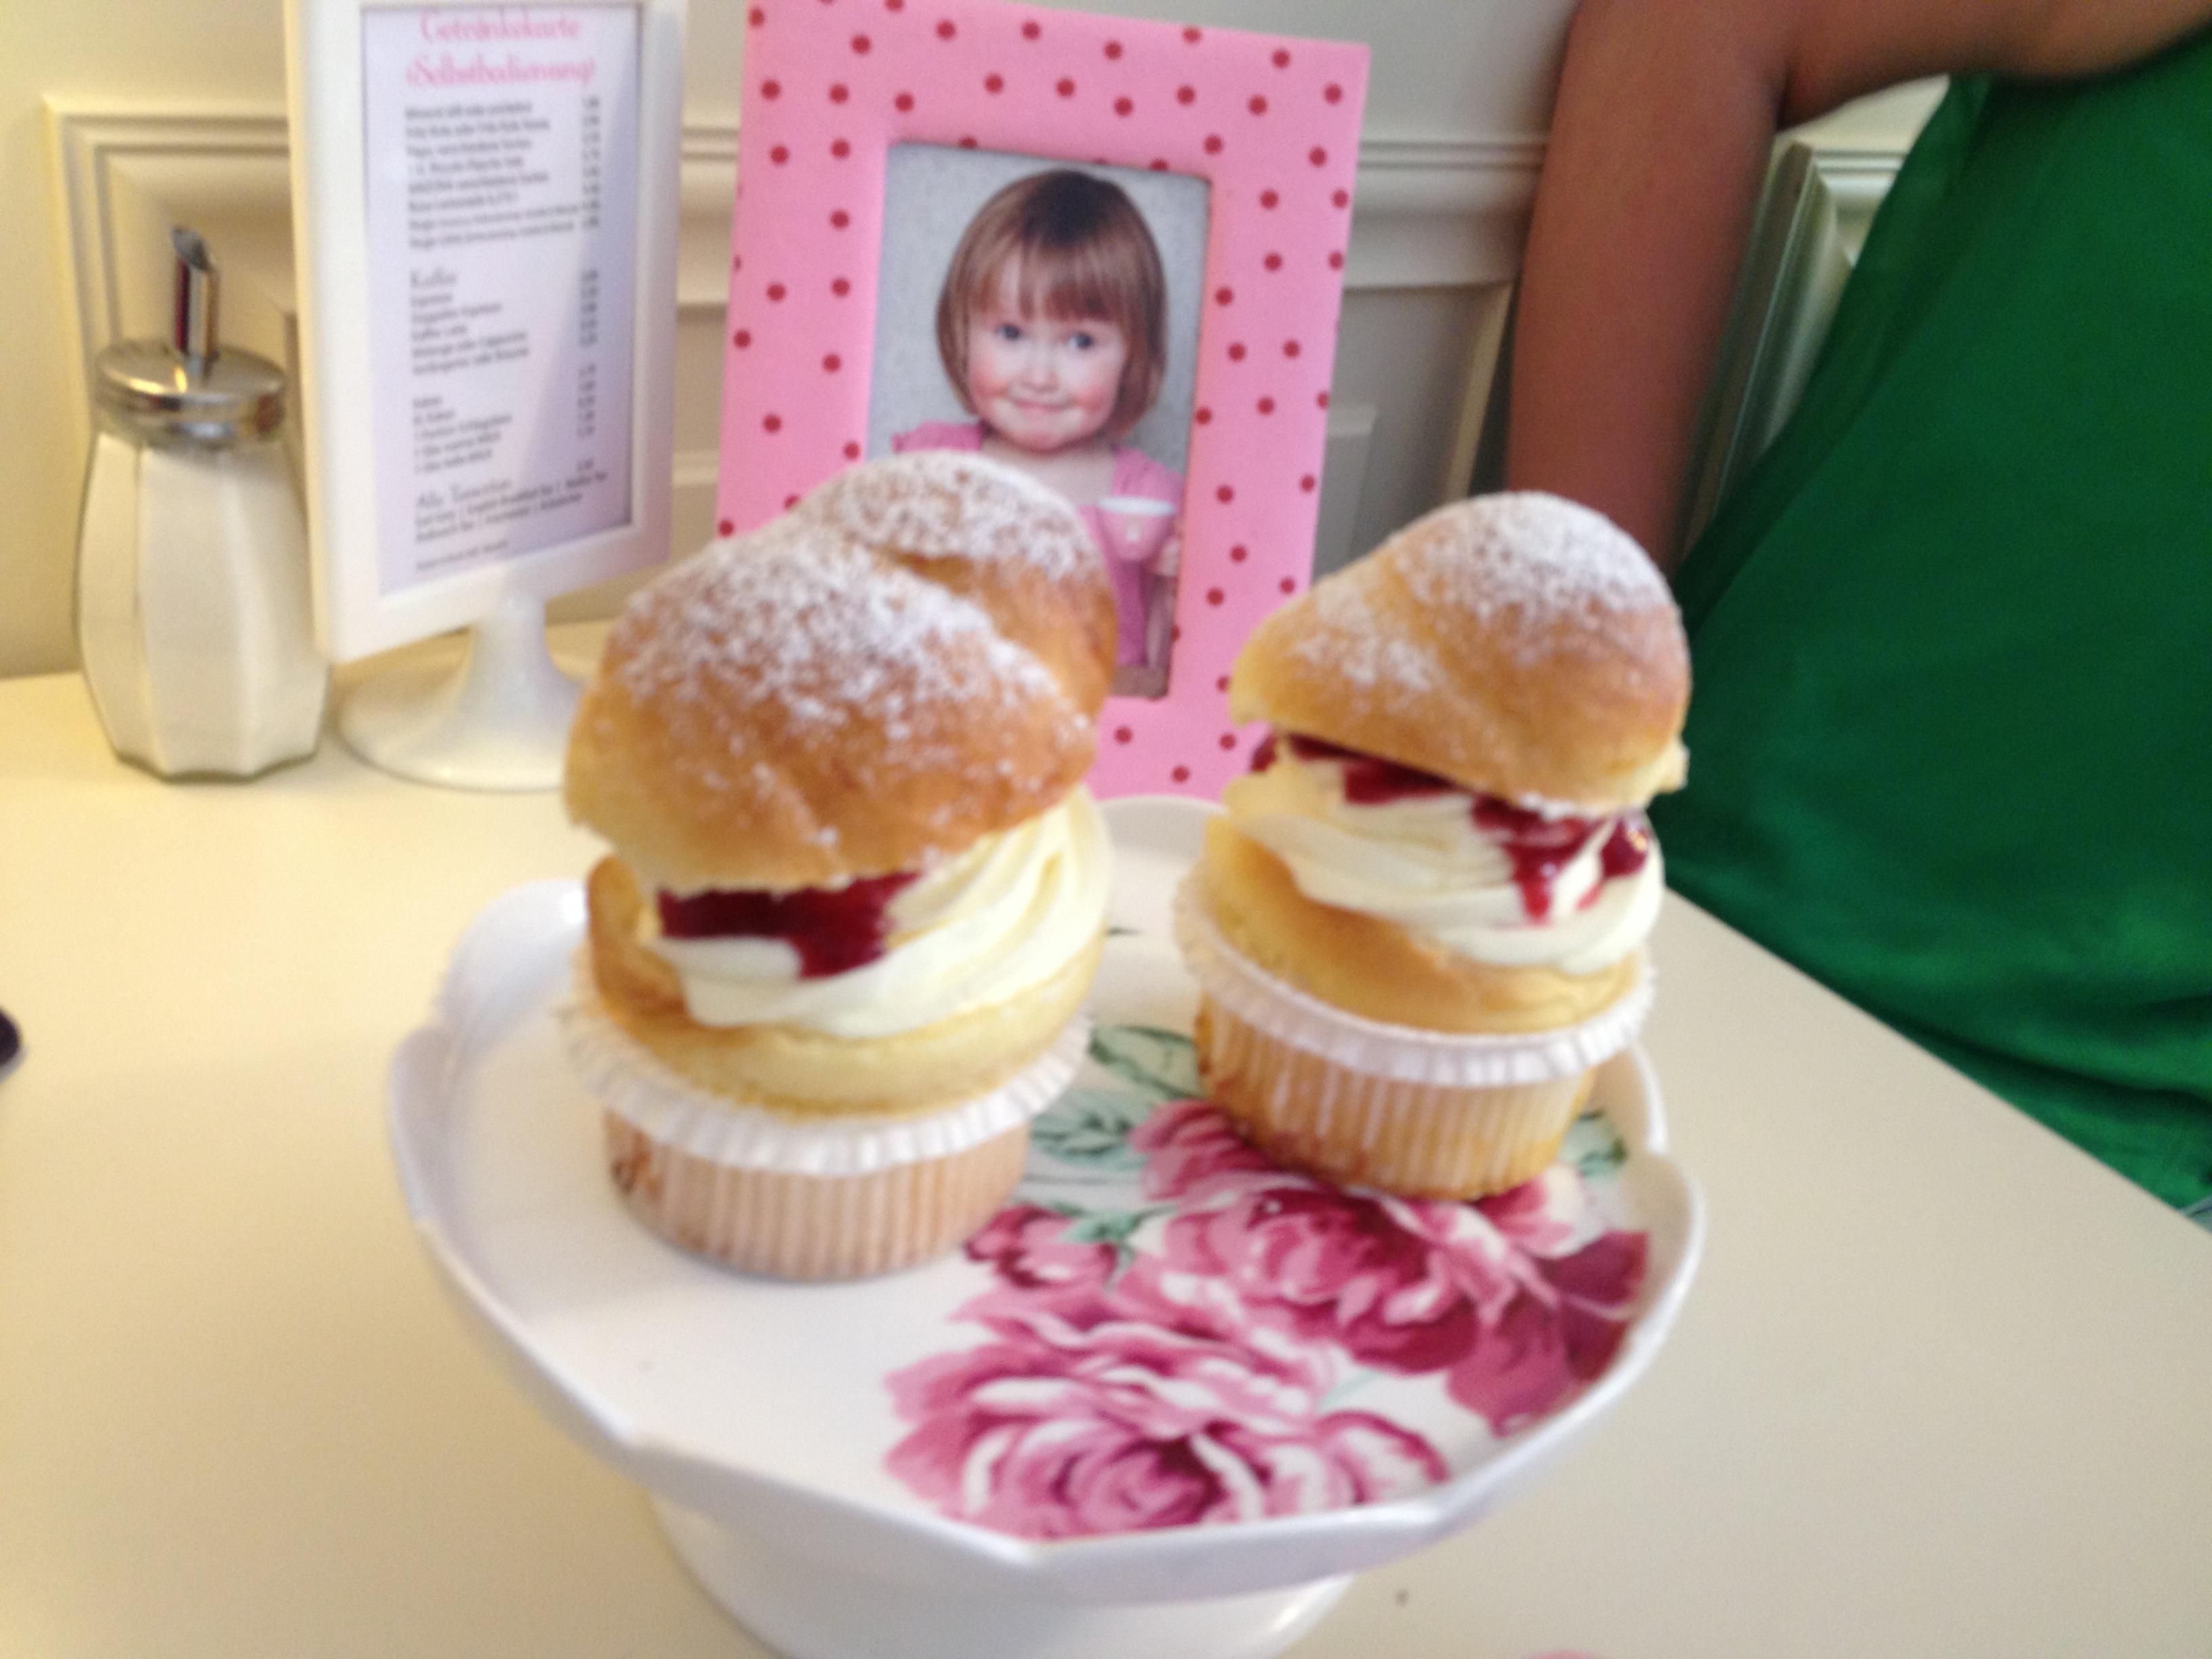 https://foodloader.net/kugs_2013-07-03_brioche_cupcakes_fruehstueck.jpg